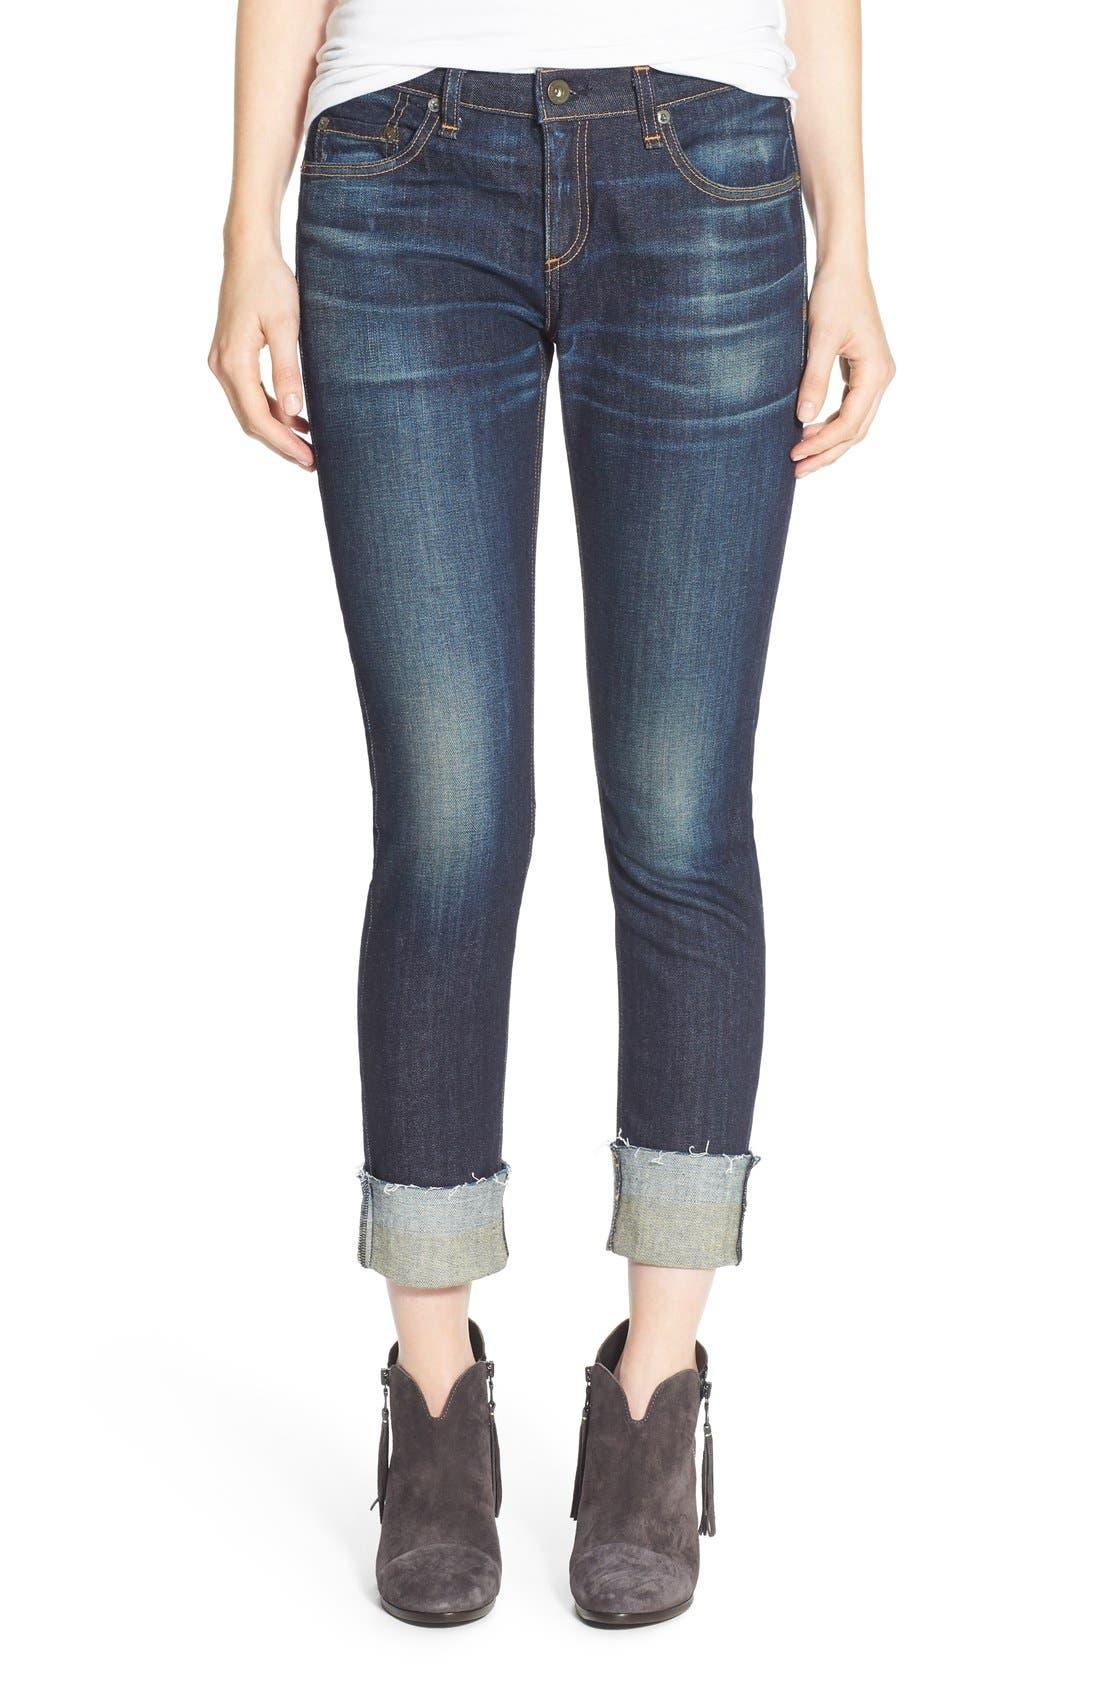 Alternate Image 1 Selected - rag & bone/JEAN 'The Dre' Slim Fit Boyfriend Jeans (Yesler)